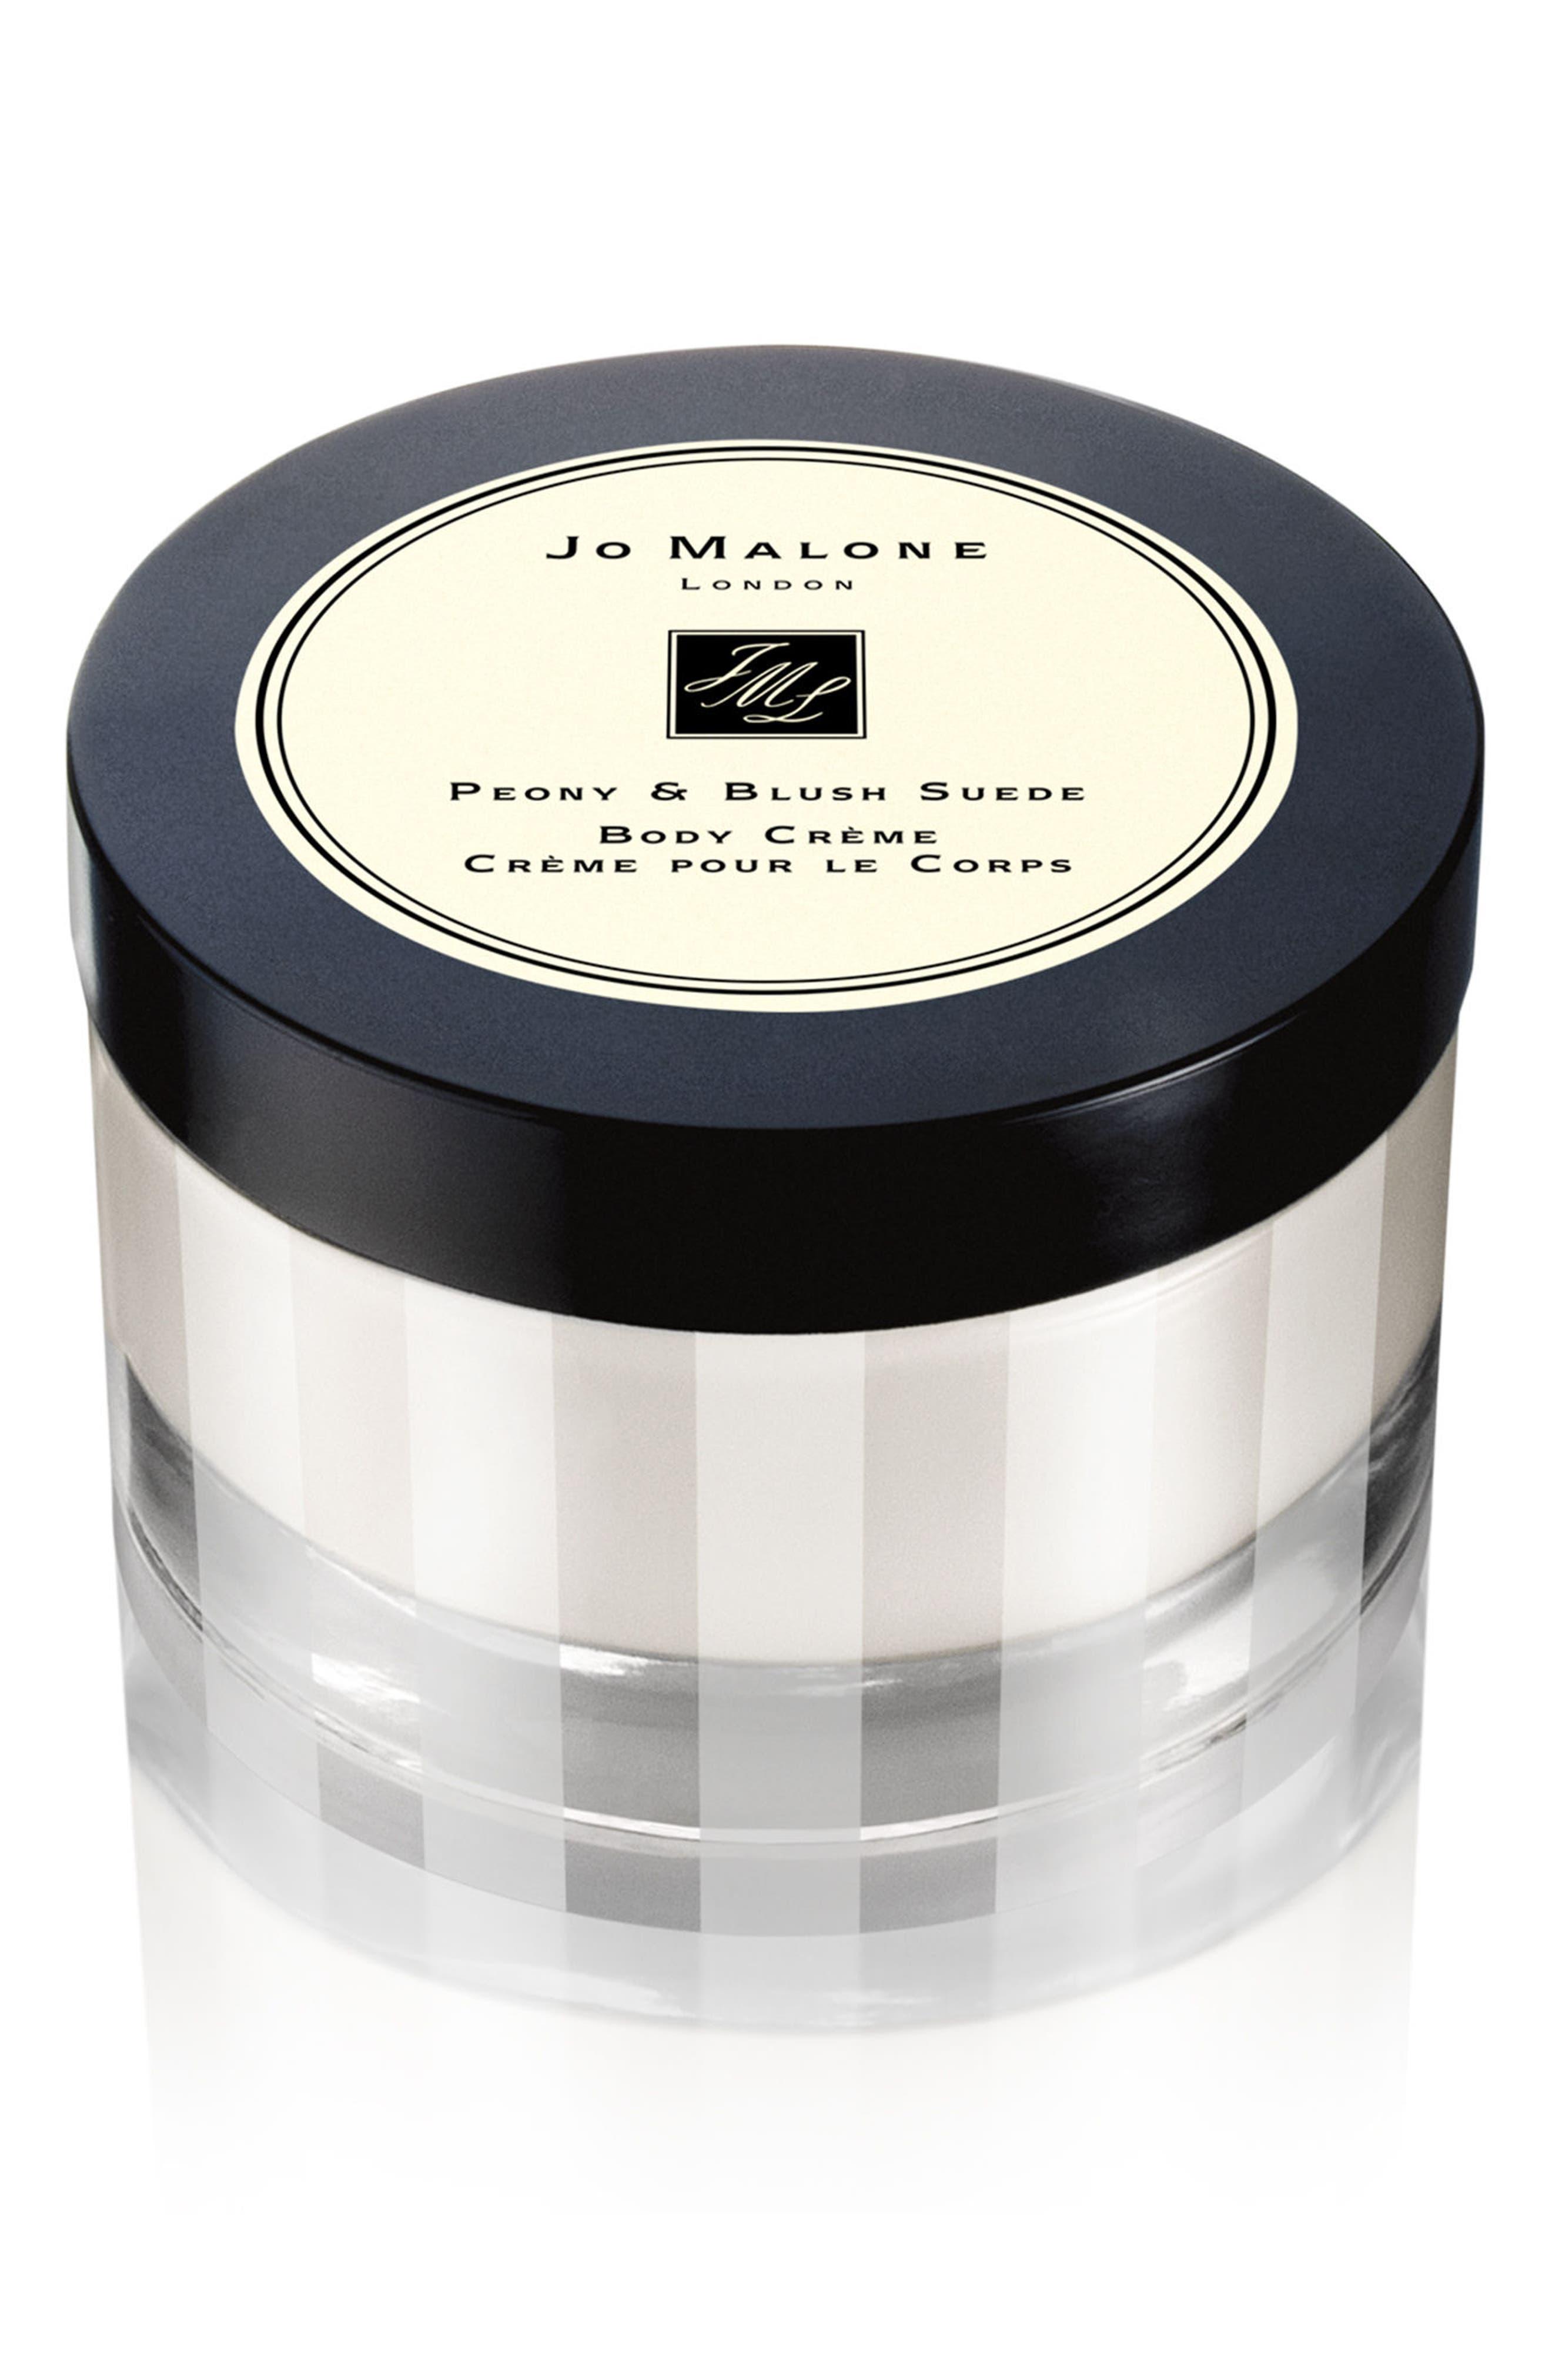 JO MALONE LONDON<SUP>™</SUP> Peony & Blush Suede Body Crème, Main, color, NO COLOR